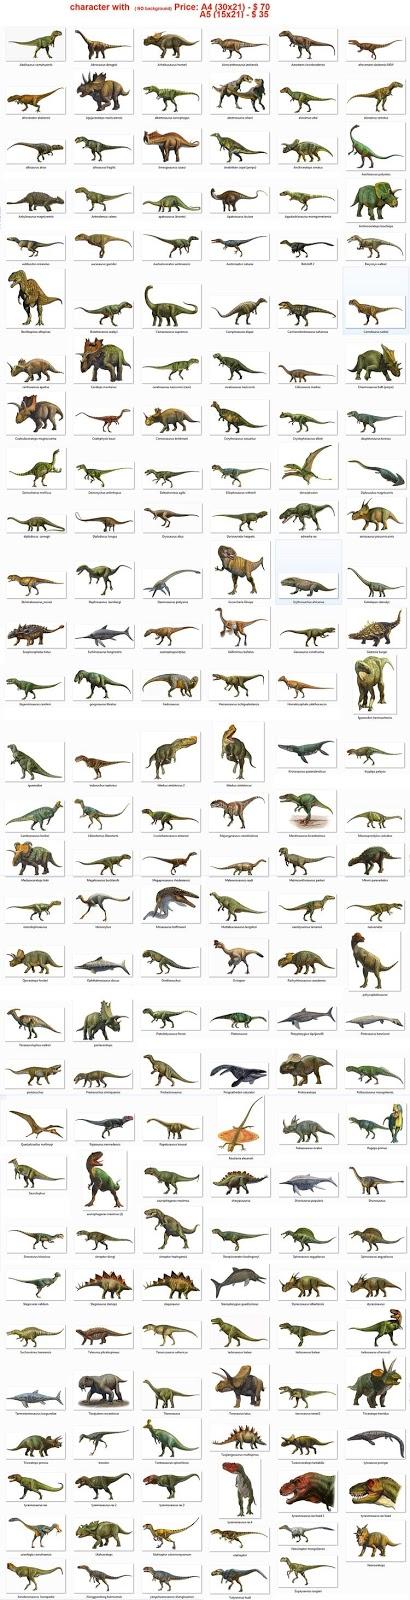 Dinossauros | Dinosaurs